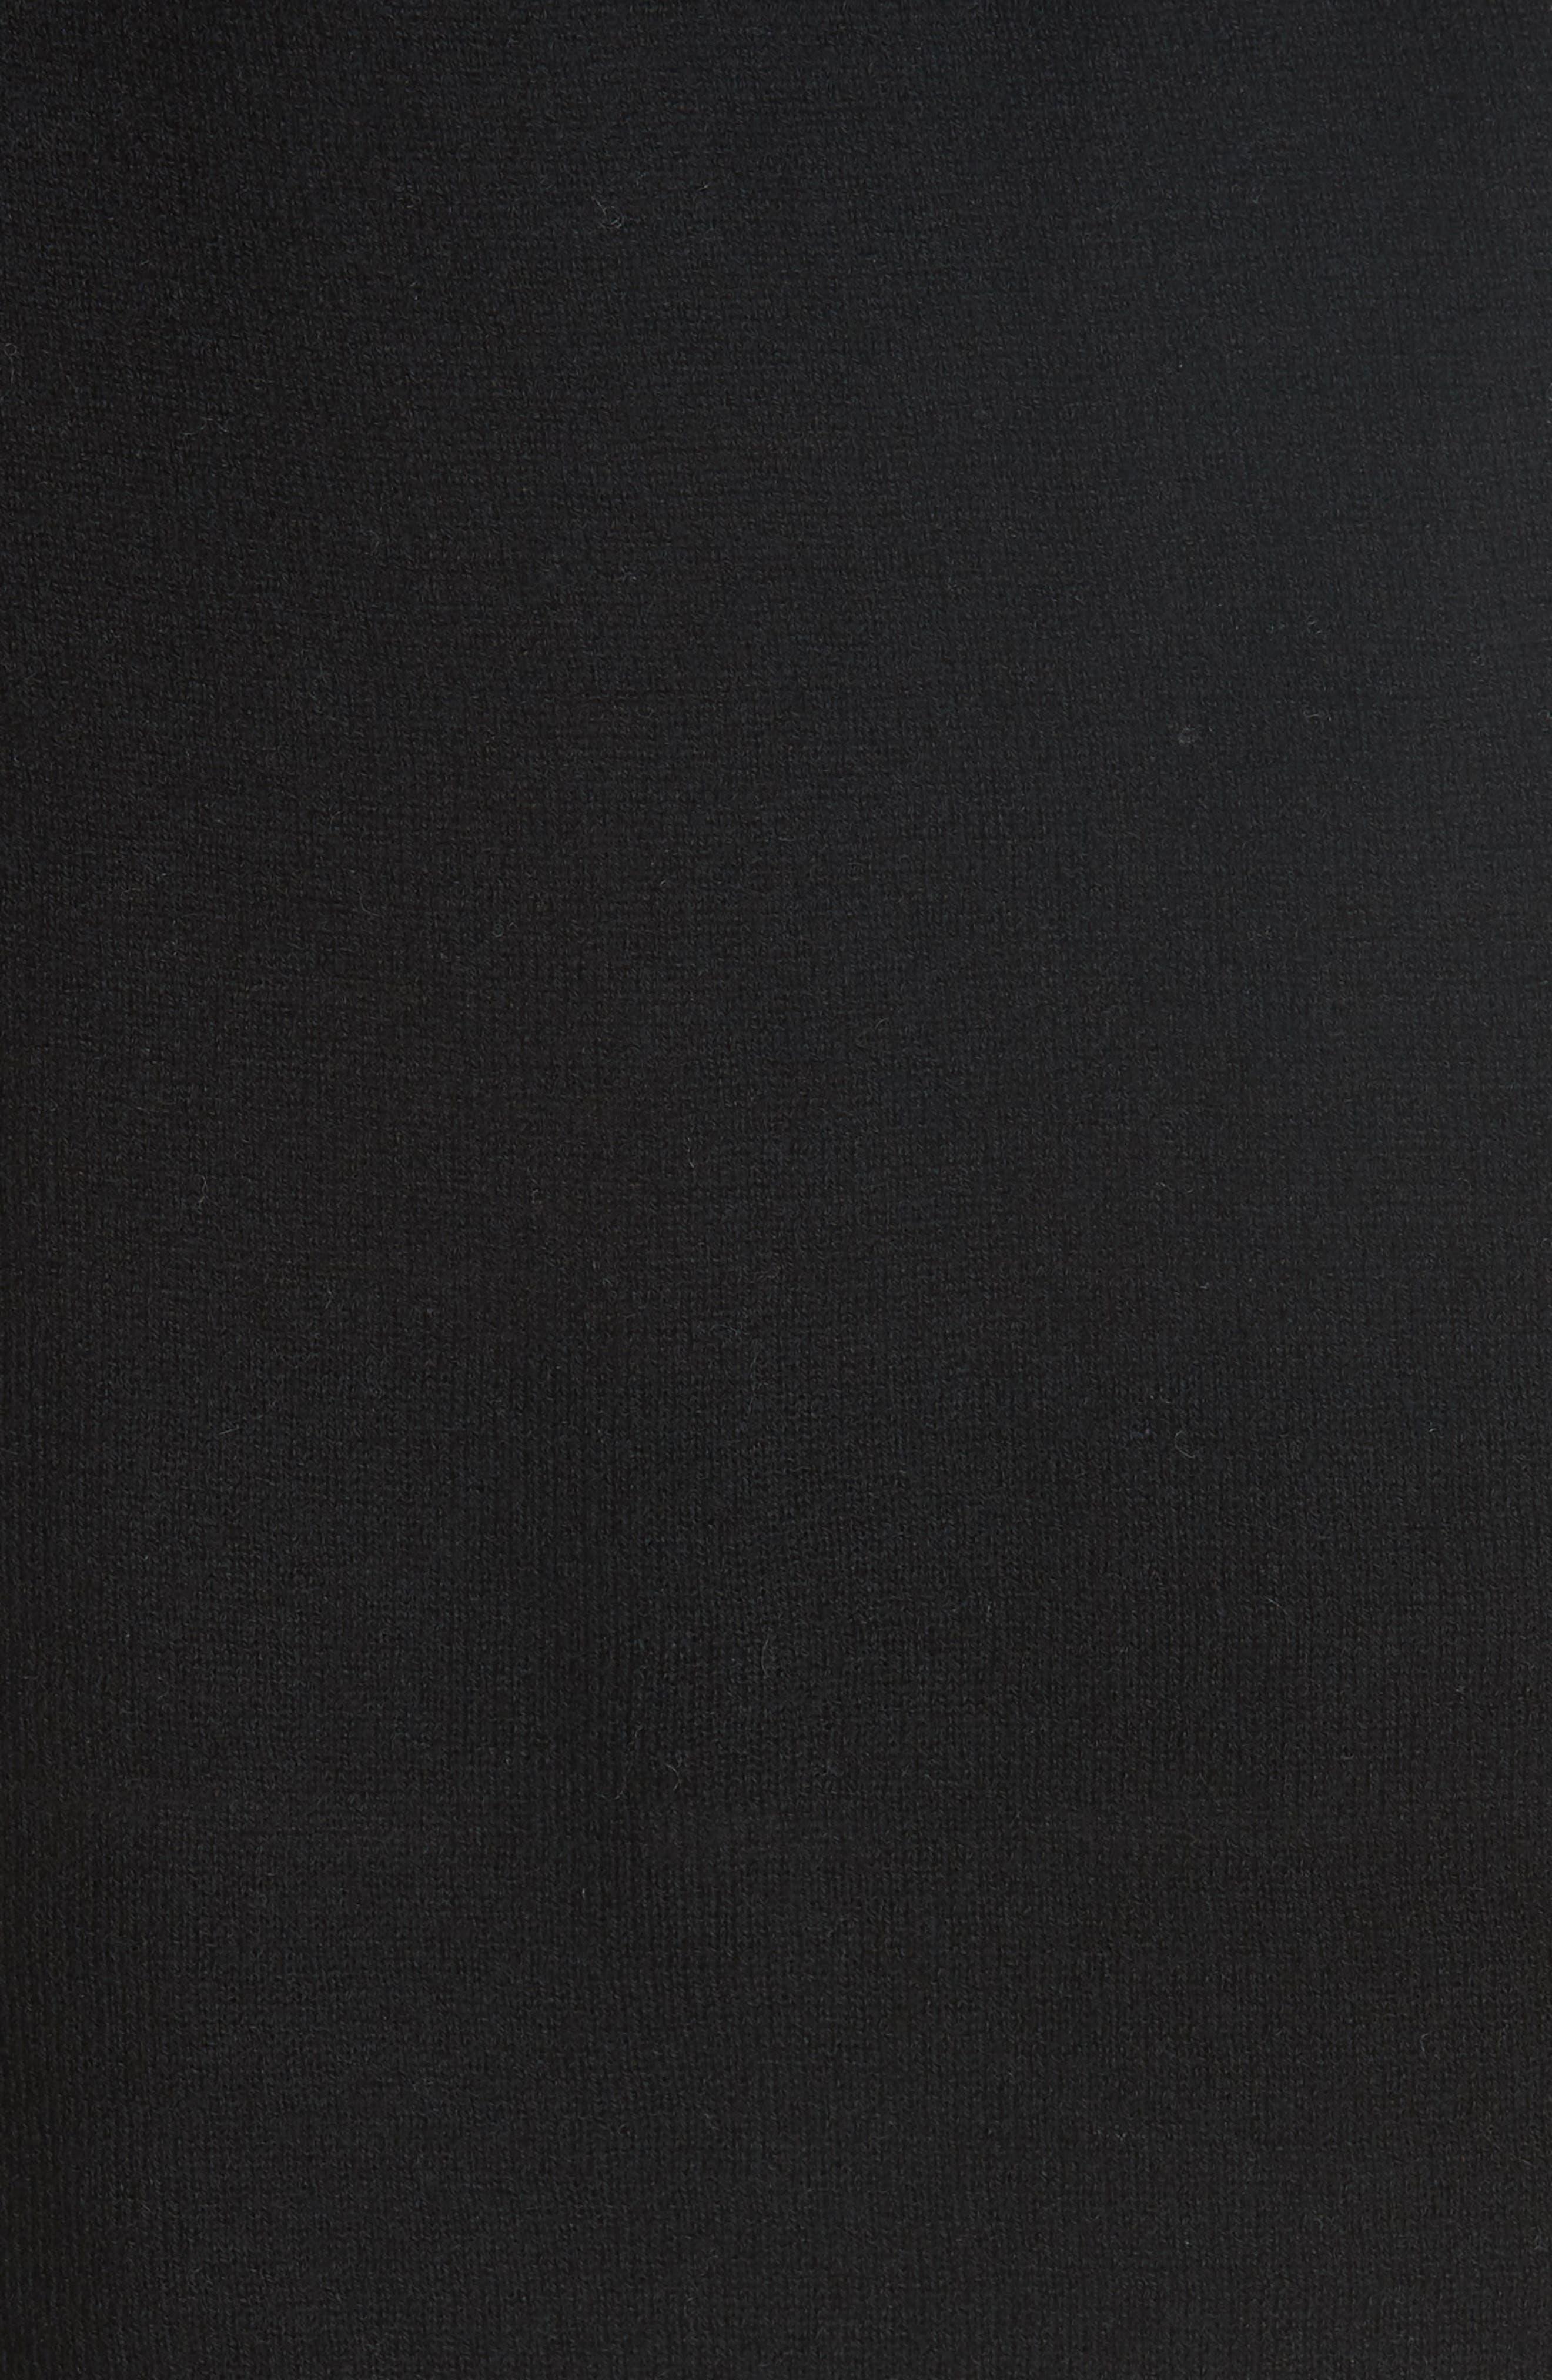 Cinched Back Cashmere Sweater,                             Alternate thumbnail 5, color,                             Black